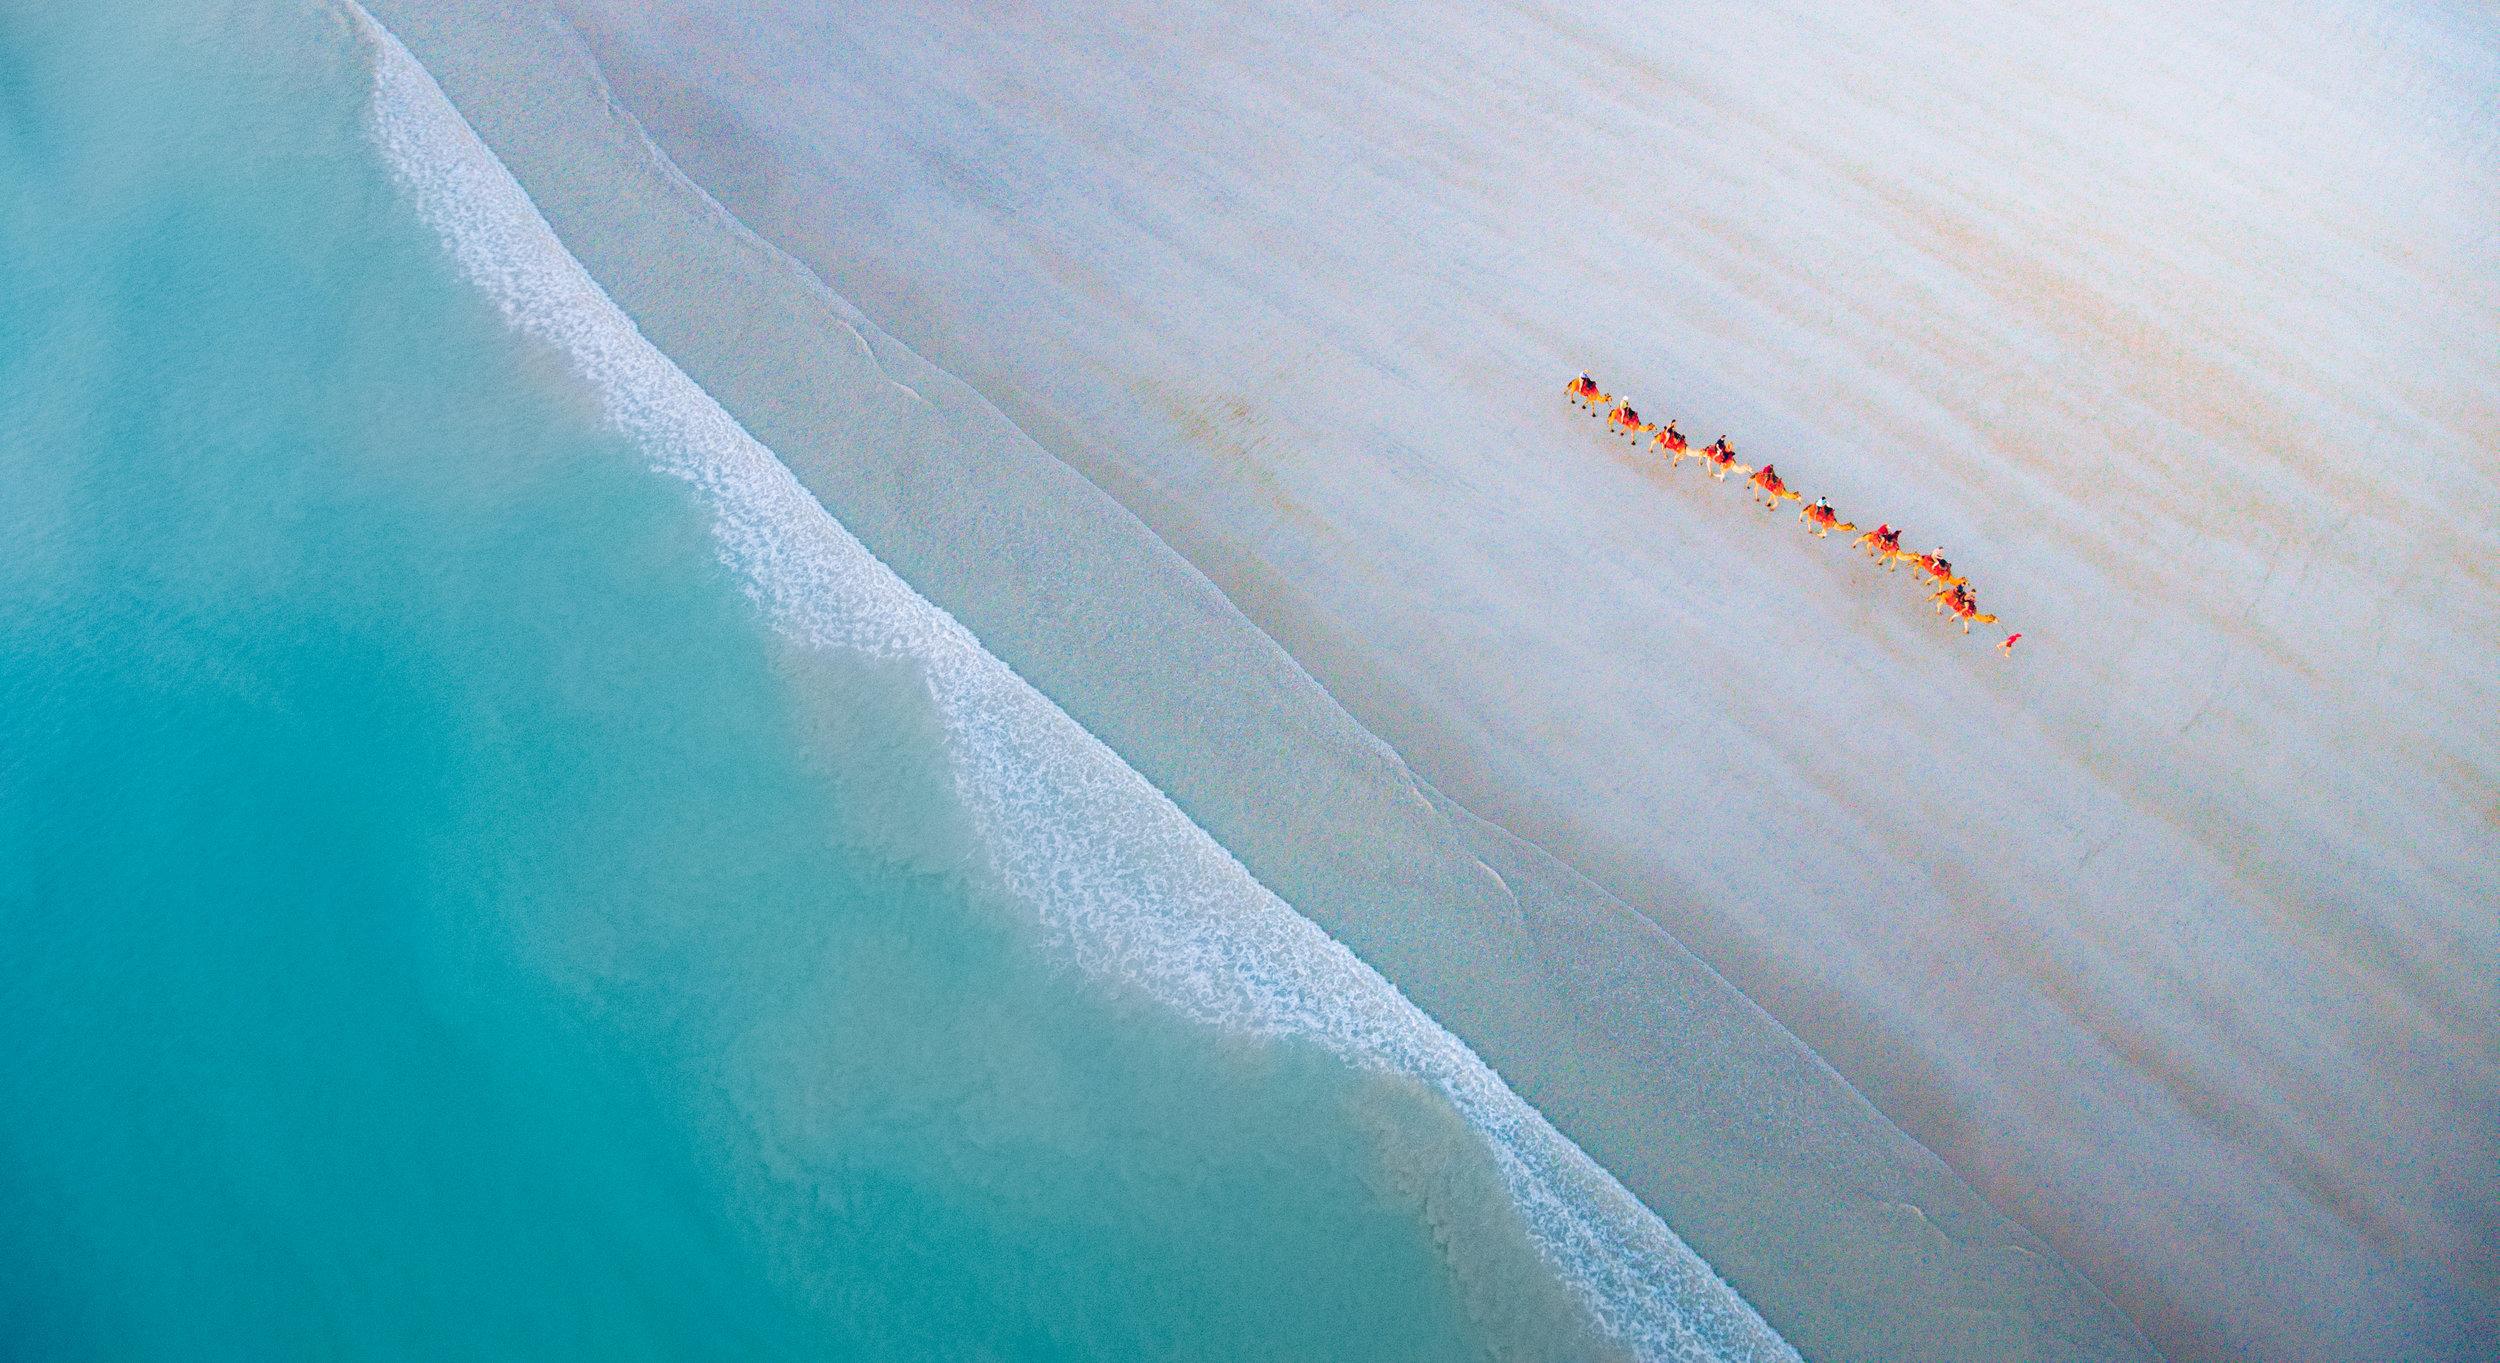 CAMEL BROOME BEACH